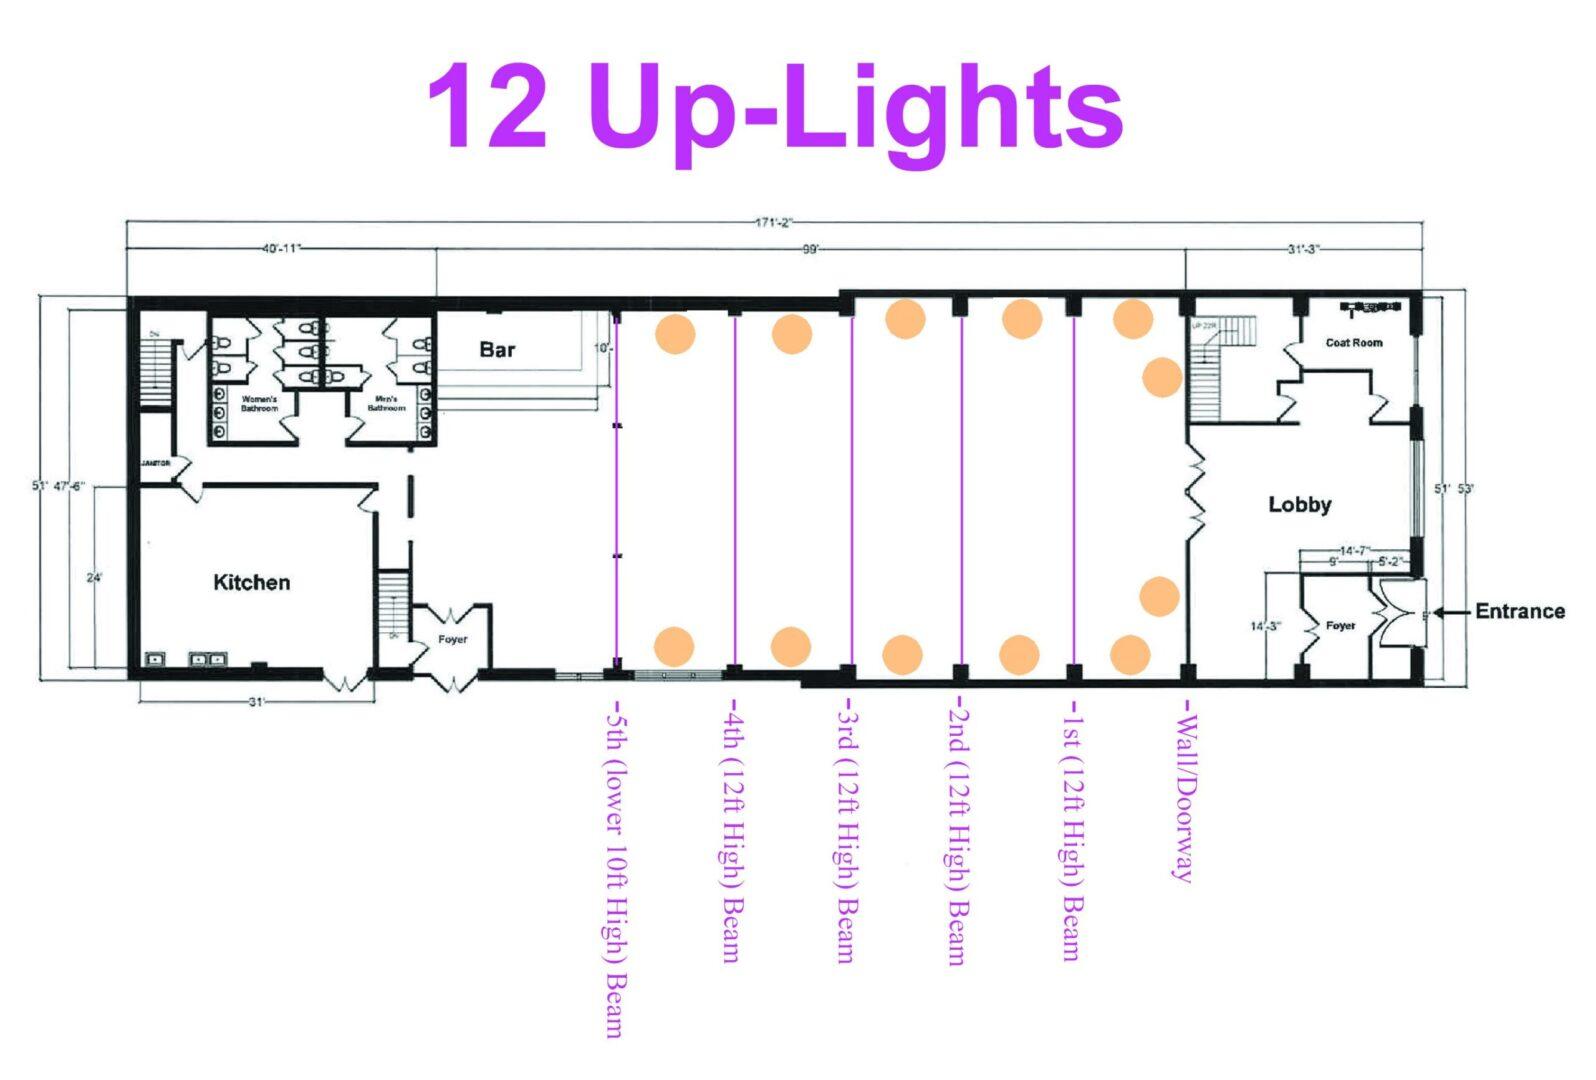 26 Bridge (12 Up-Lights)